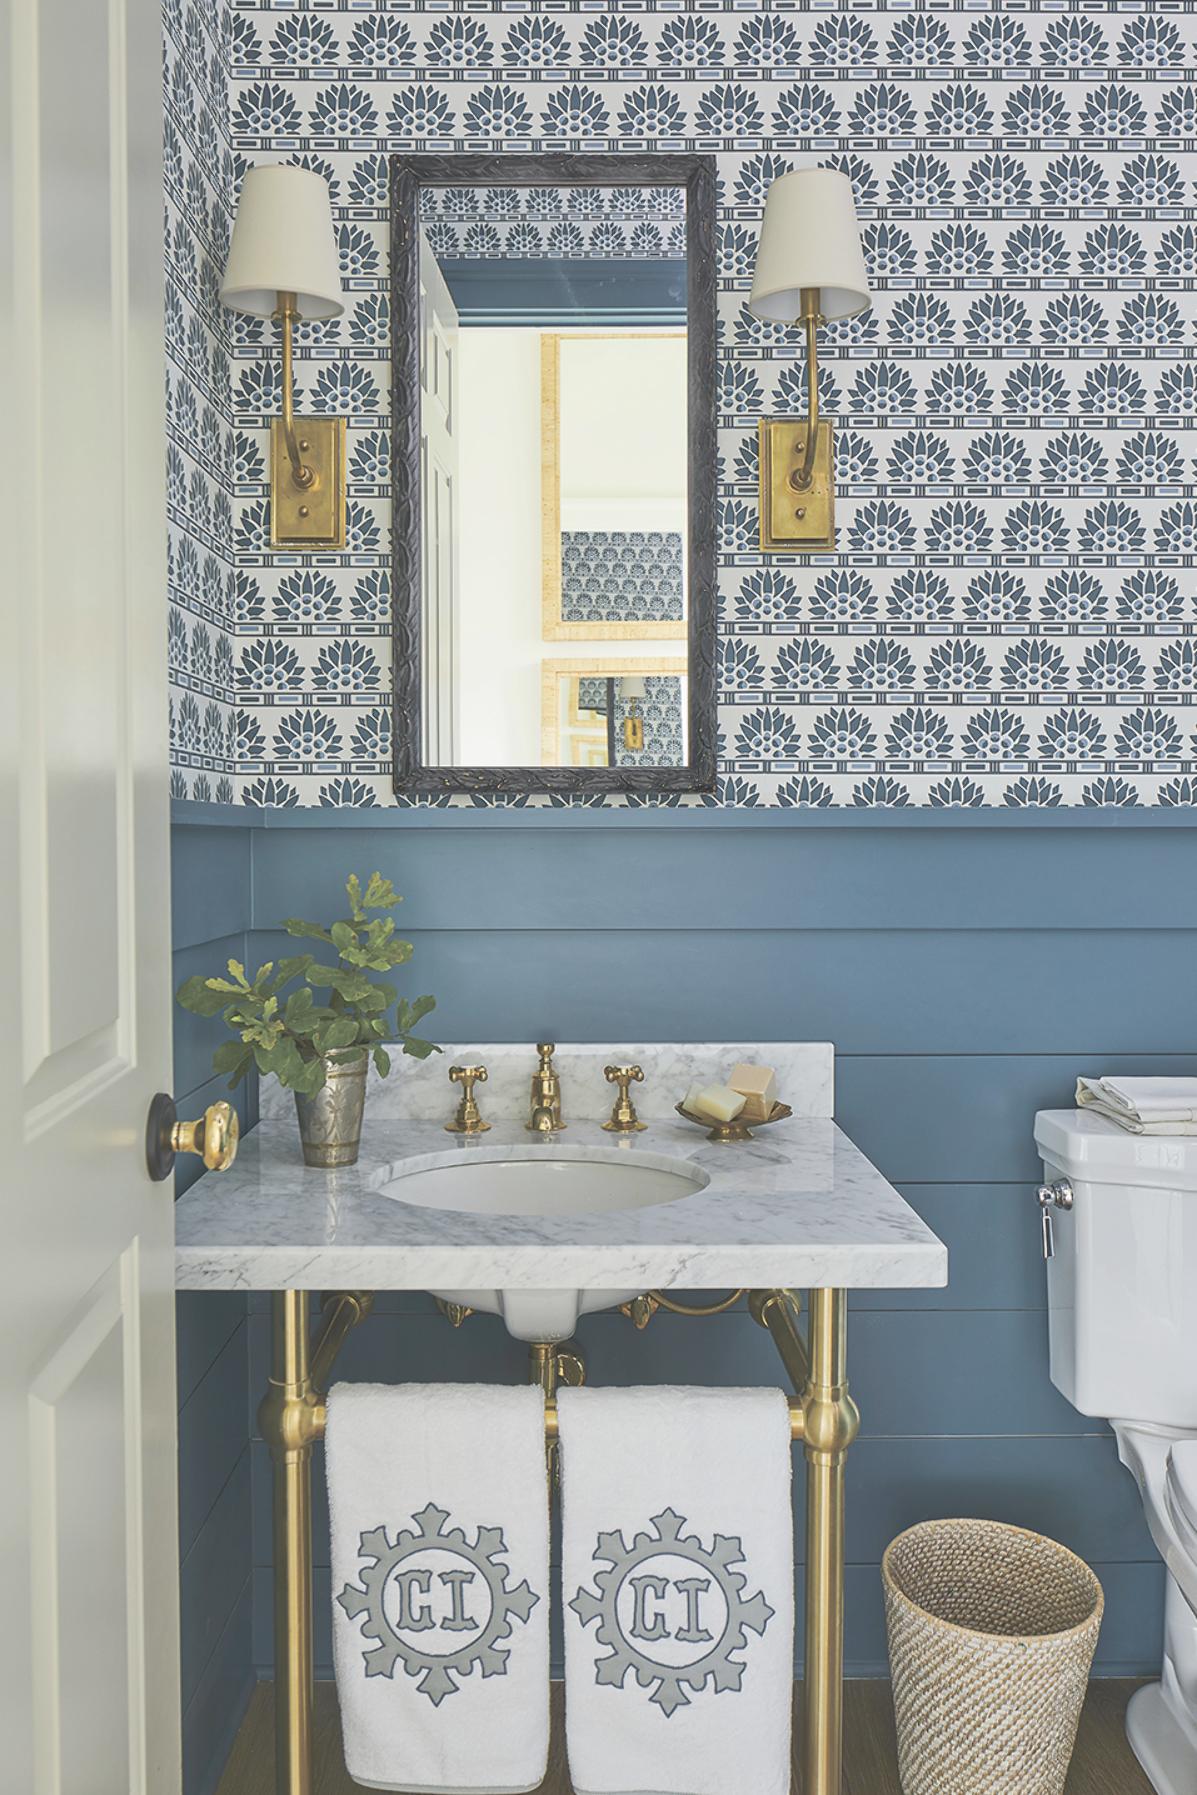 2019 Southern Living Idea House Circa Lighting Toiletten Tapete Damentoilette Haus Deko